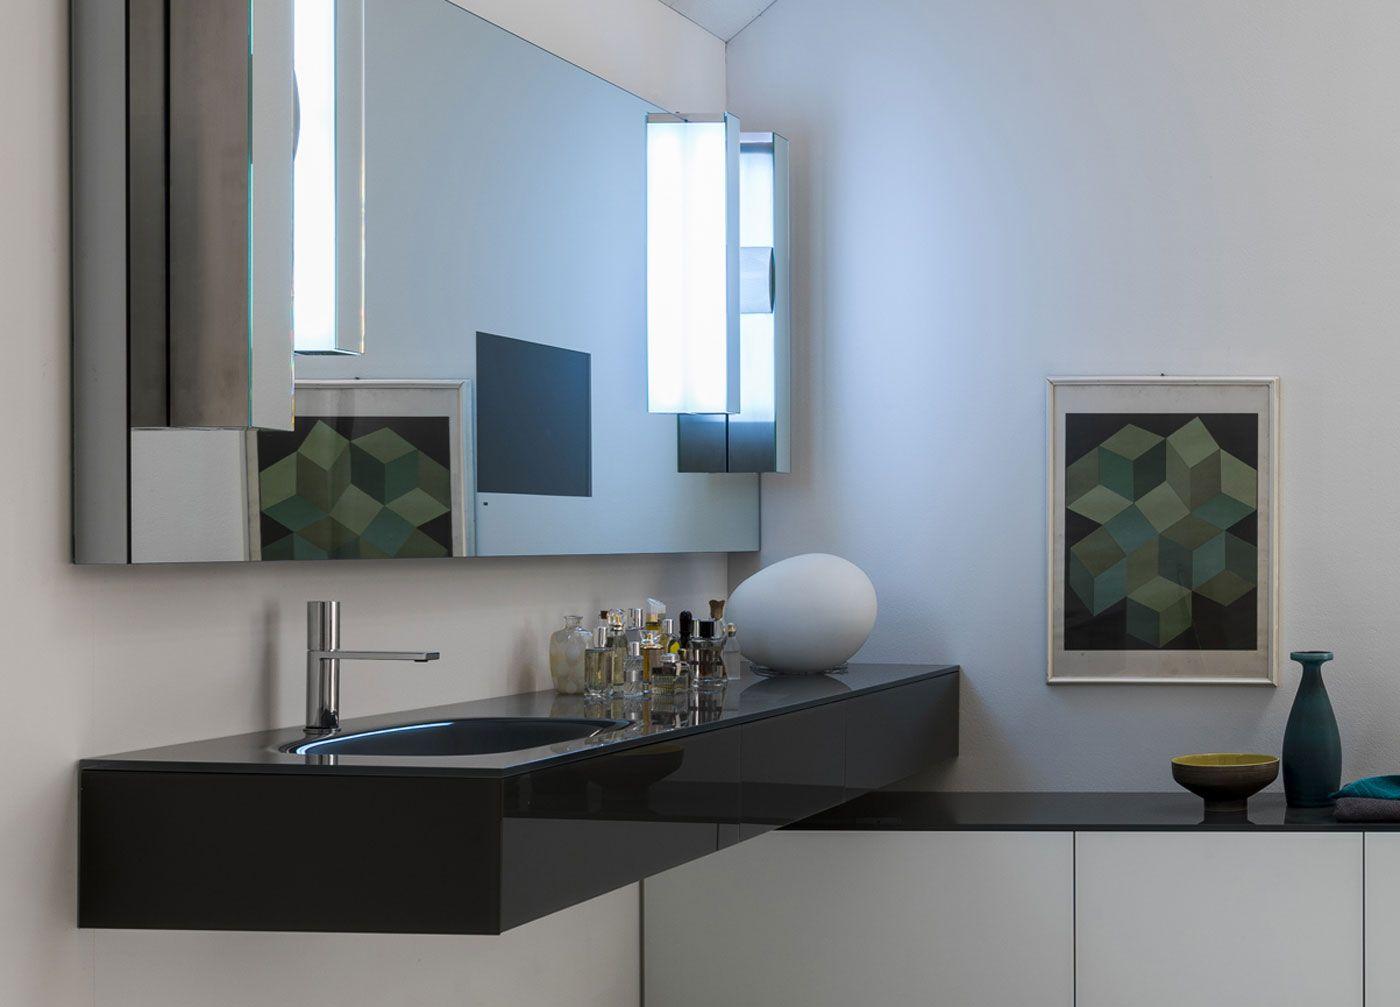 Artelinea bagno ~ Artelinea s stylish white bath vanity regolo collection